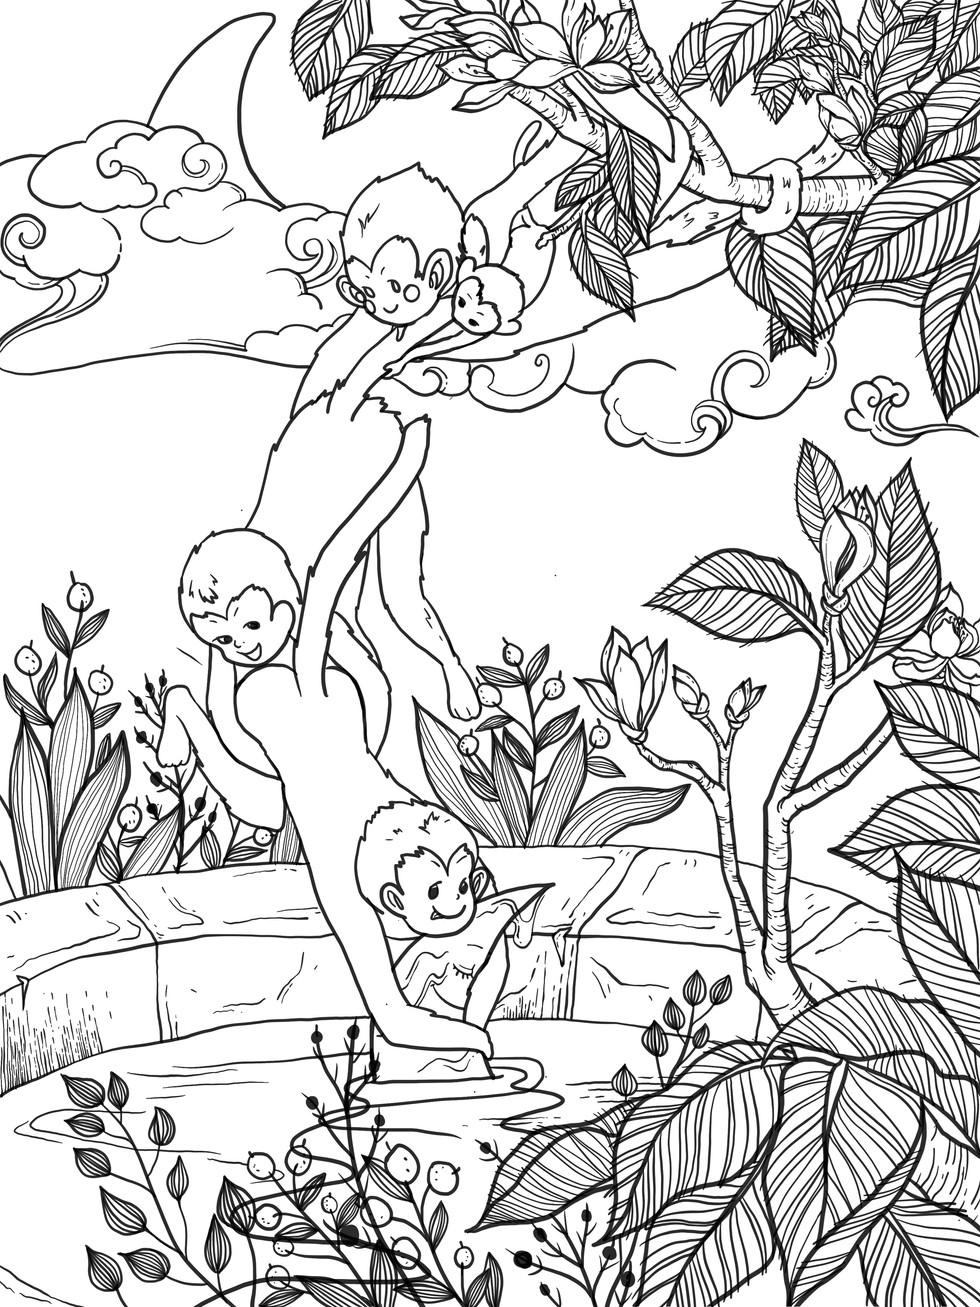 Junheng_Chen_Pj4Illustration1.jpg